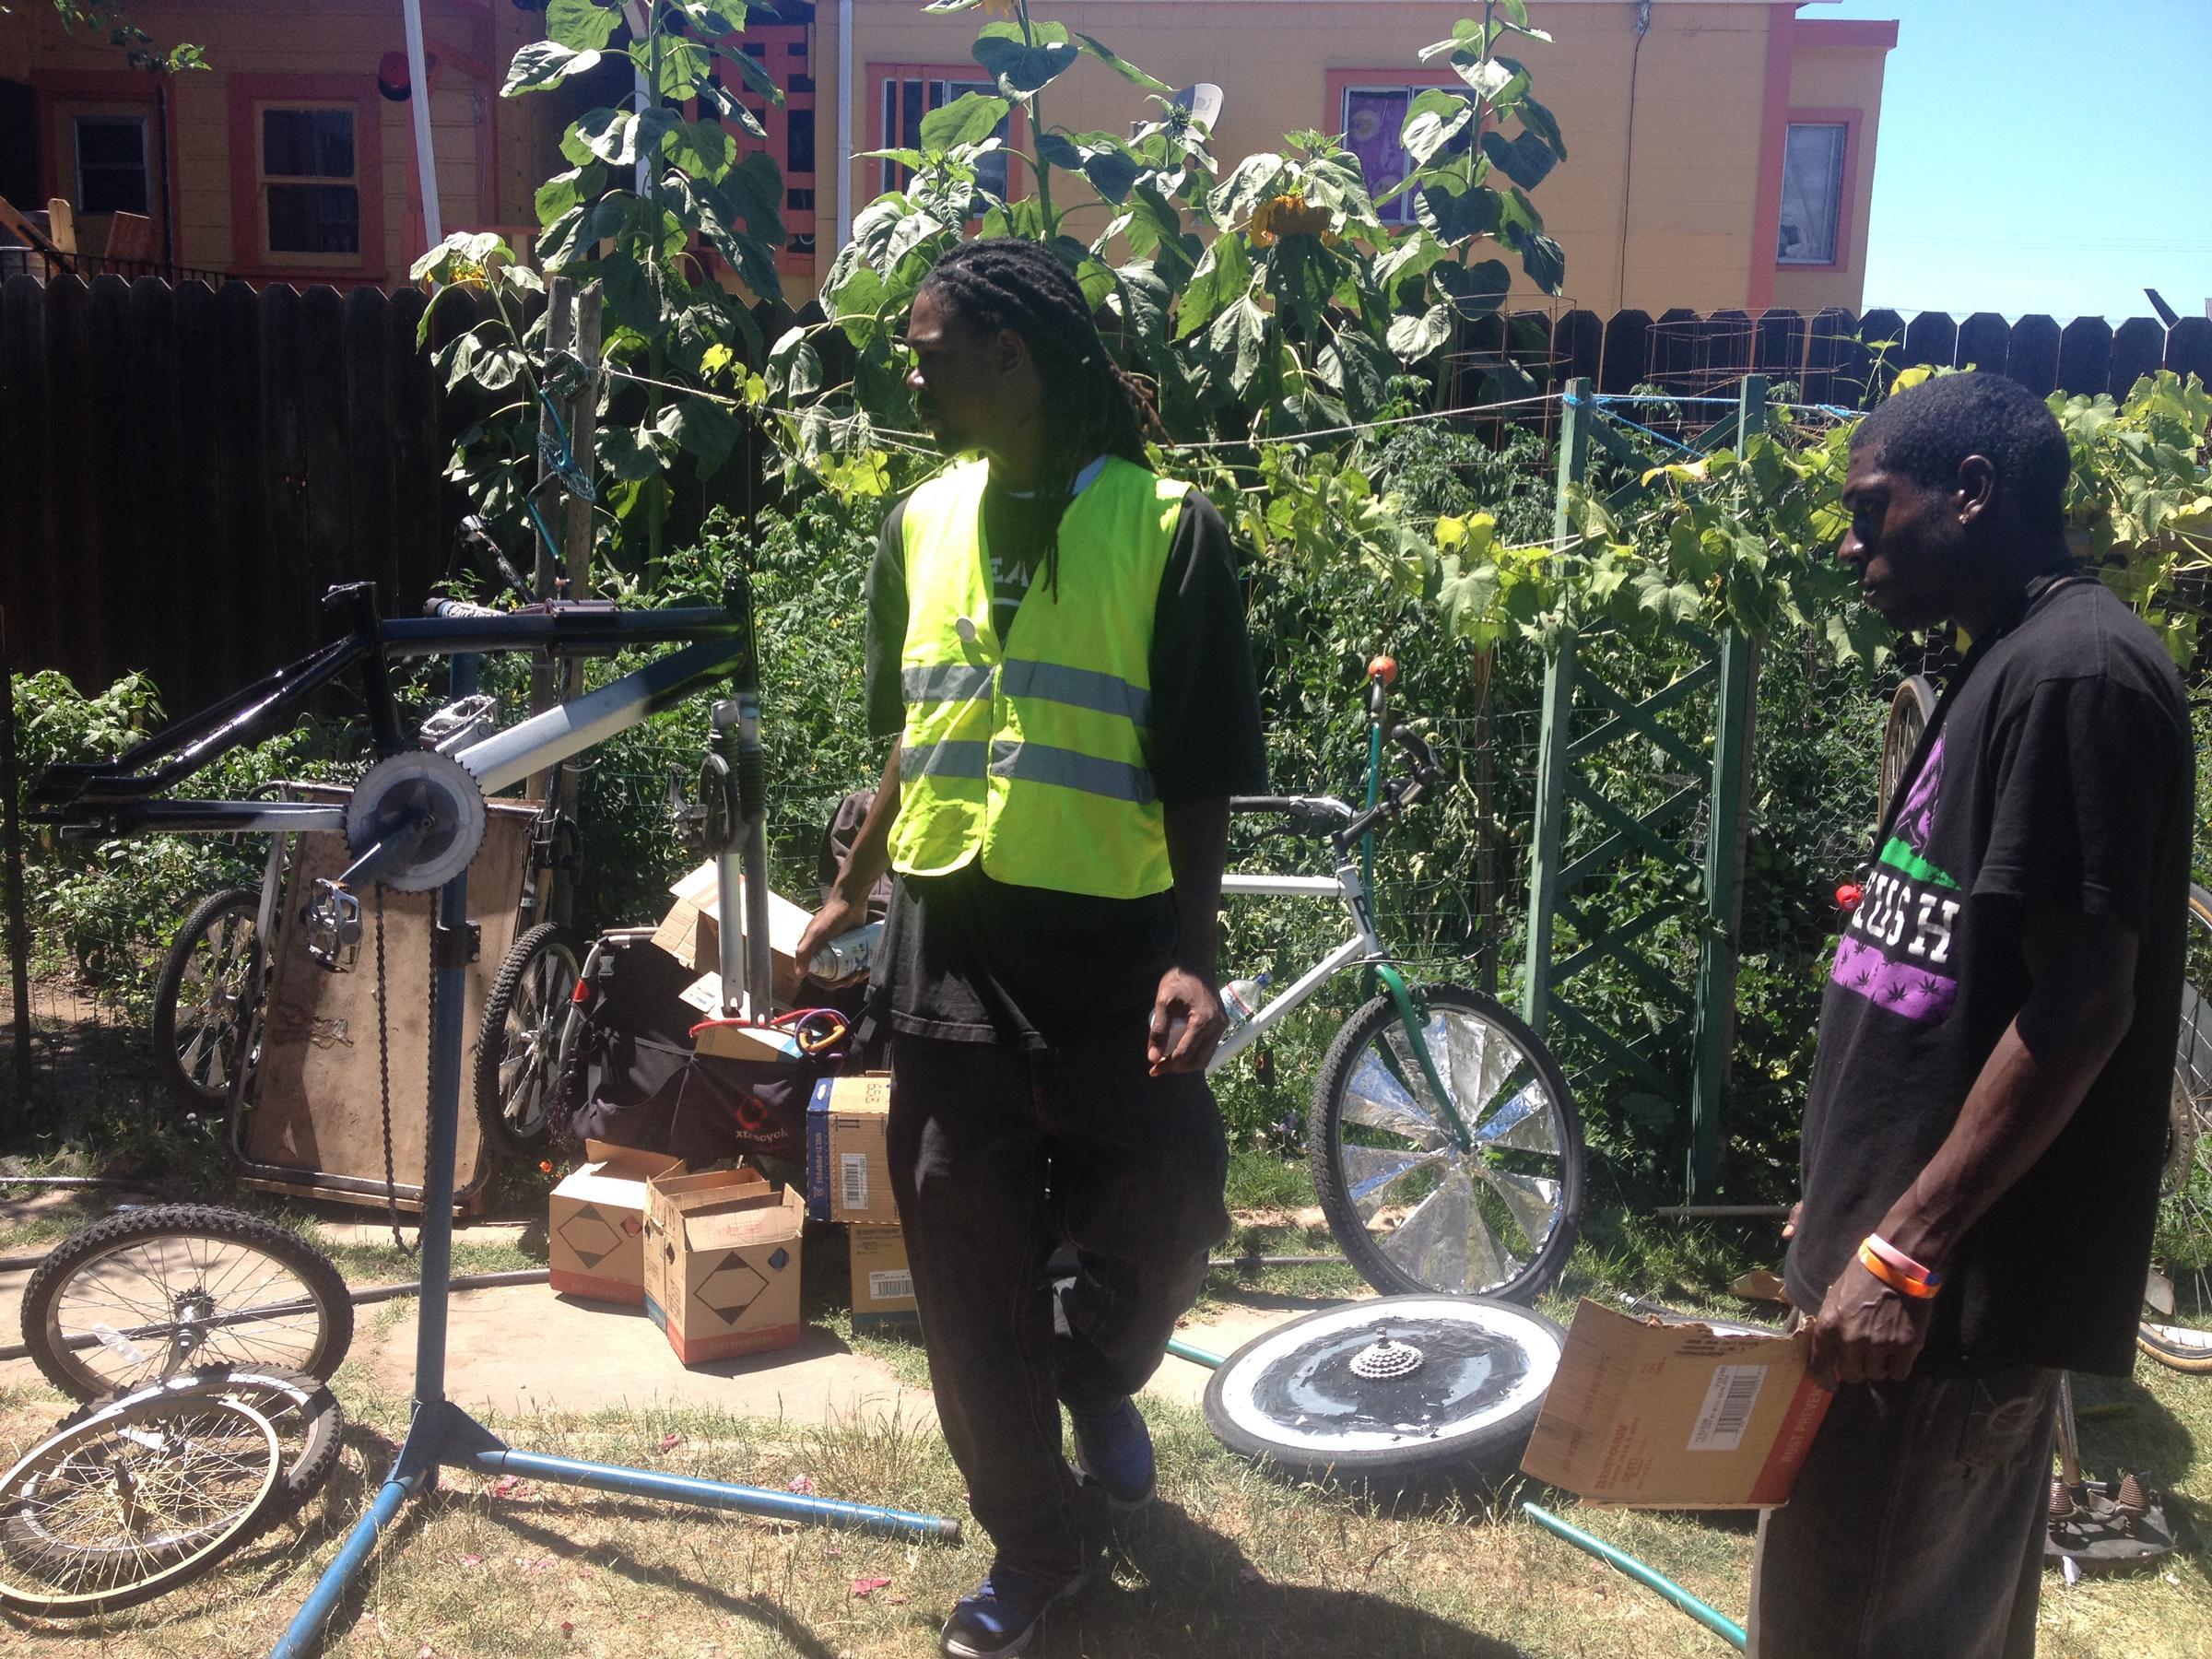 east oakland u0027s scraper bike team takes over the streets